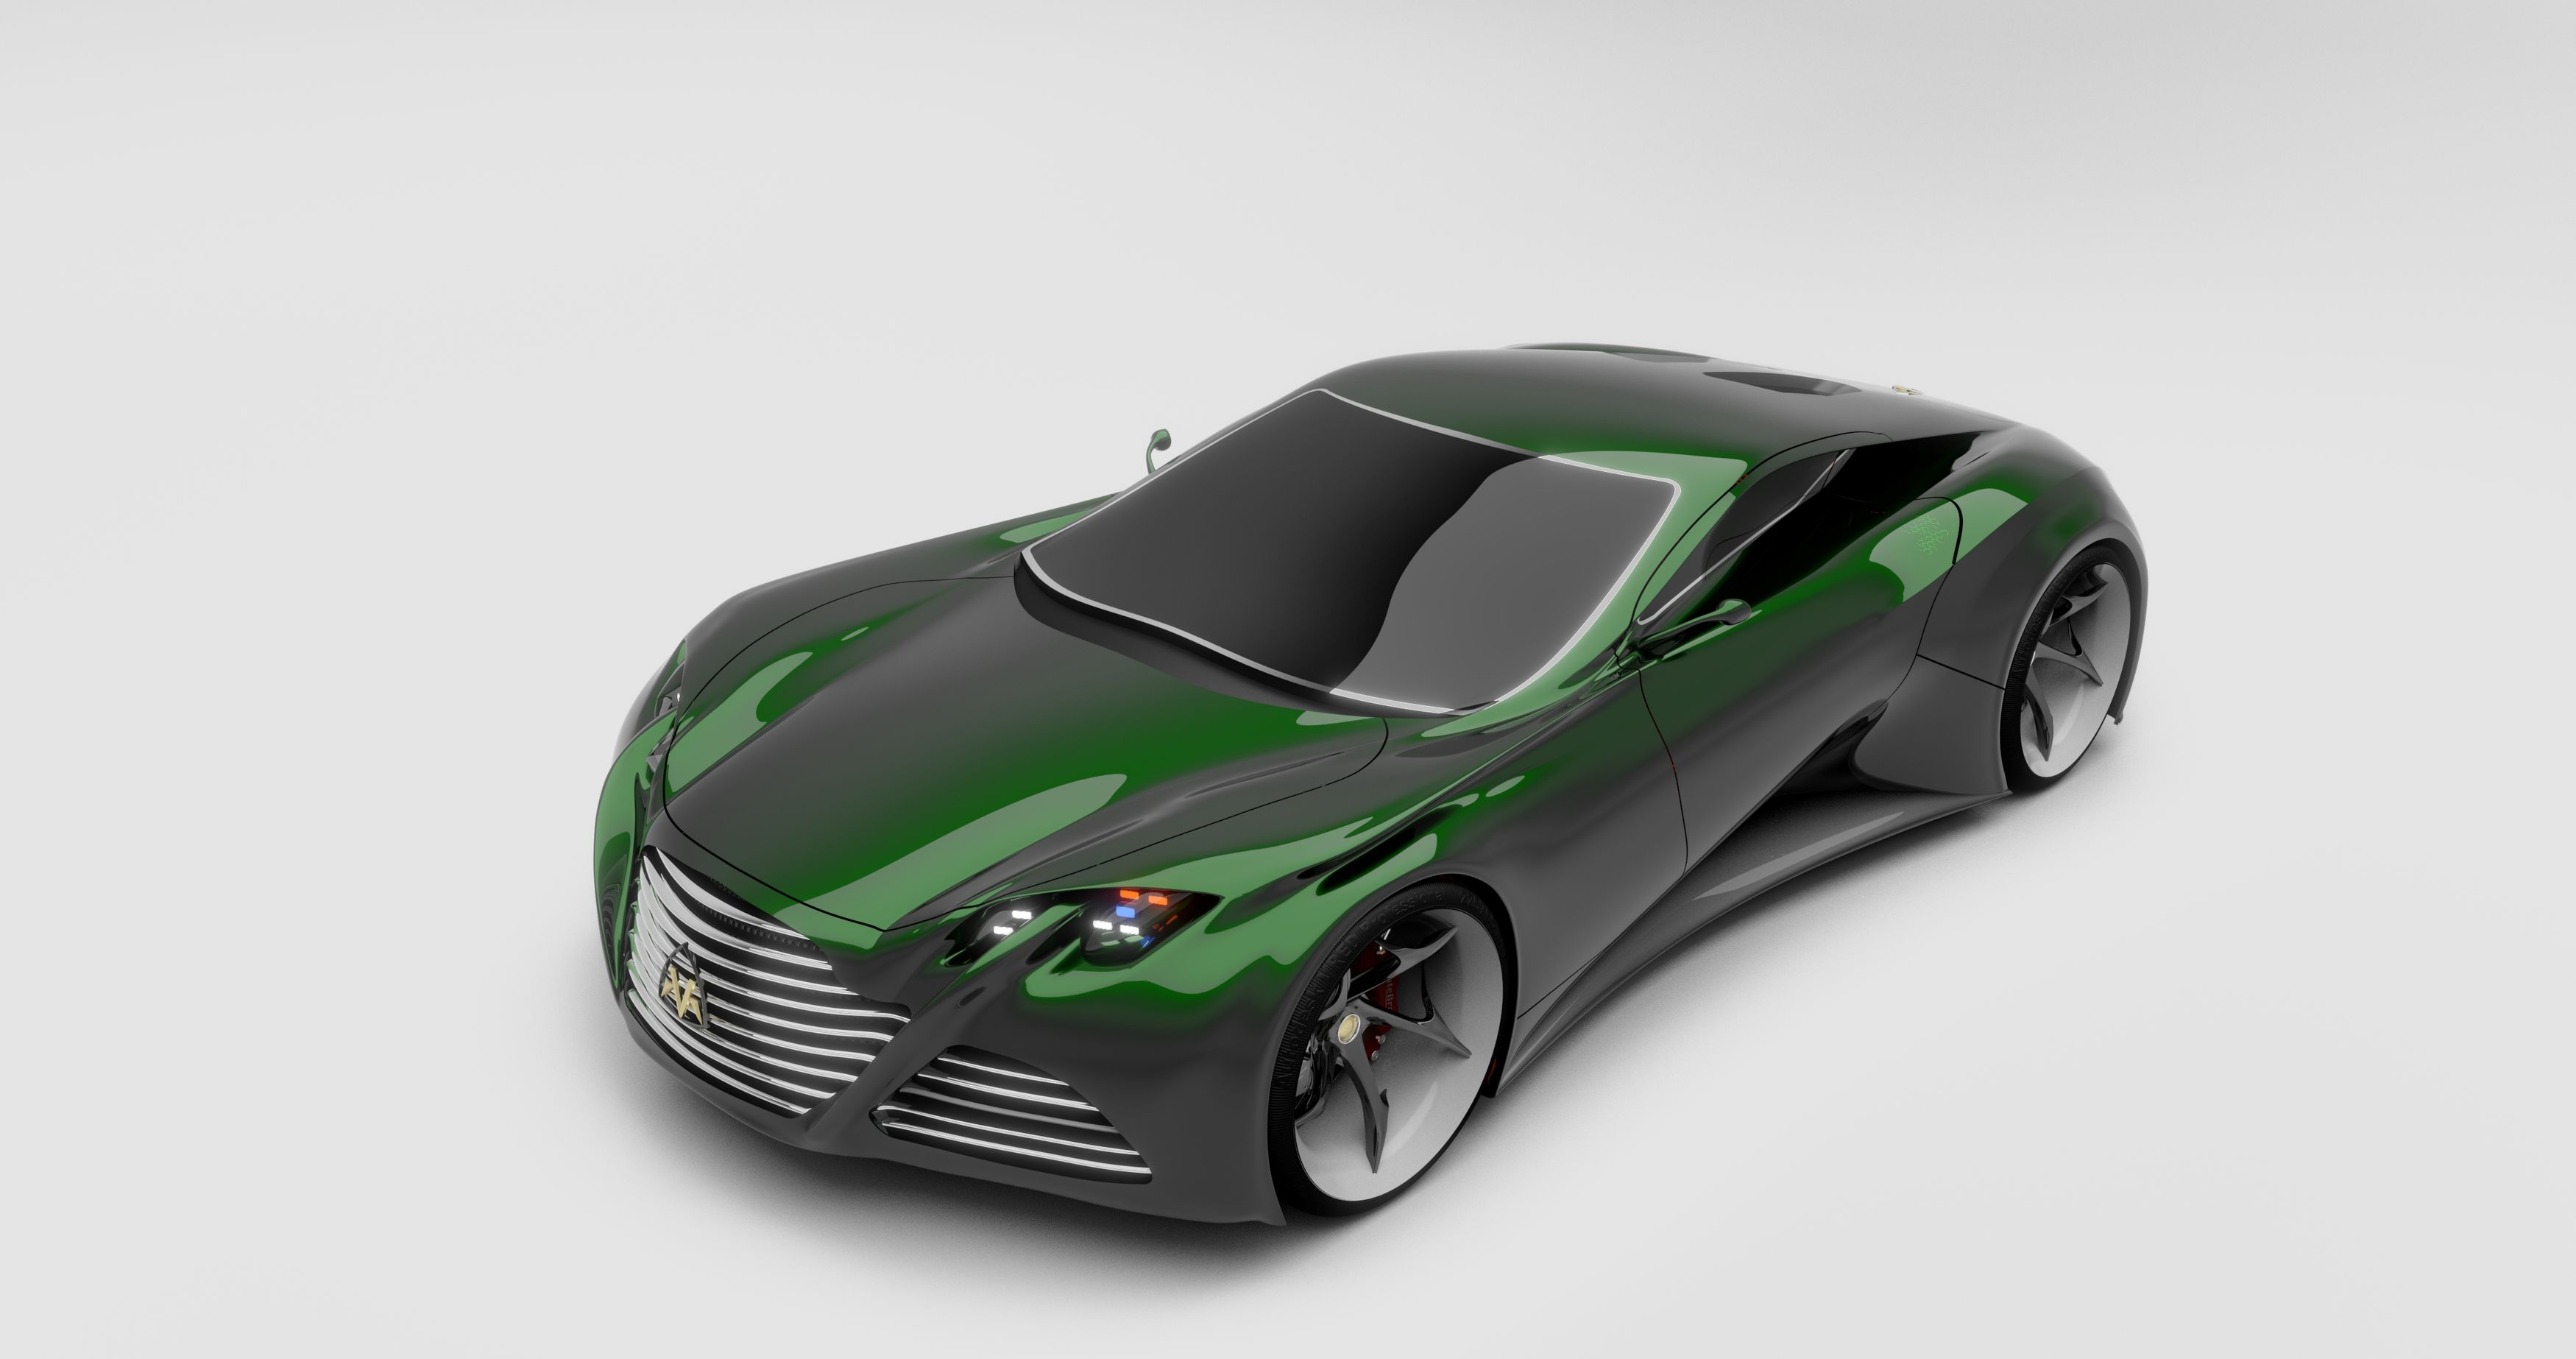 Aston-martin-db-next-x-3-3500-3500